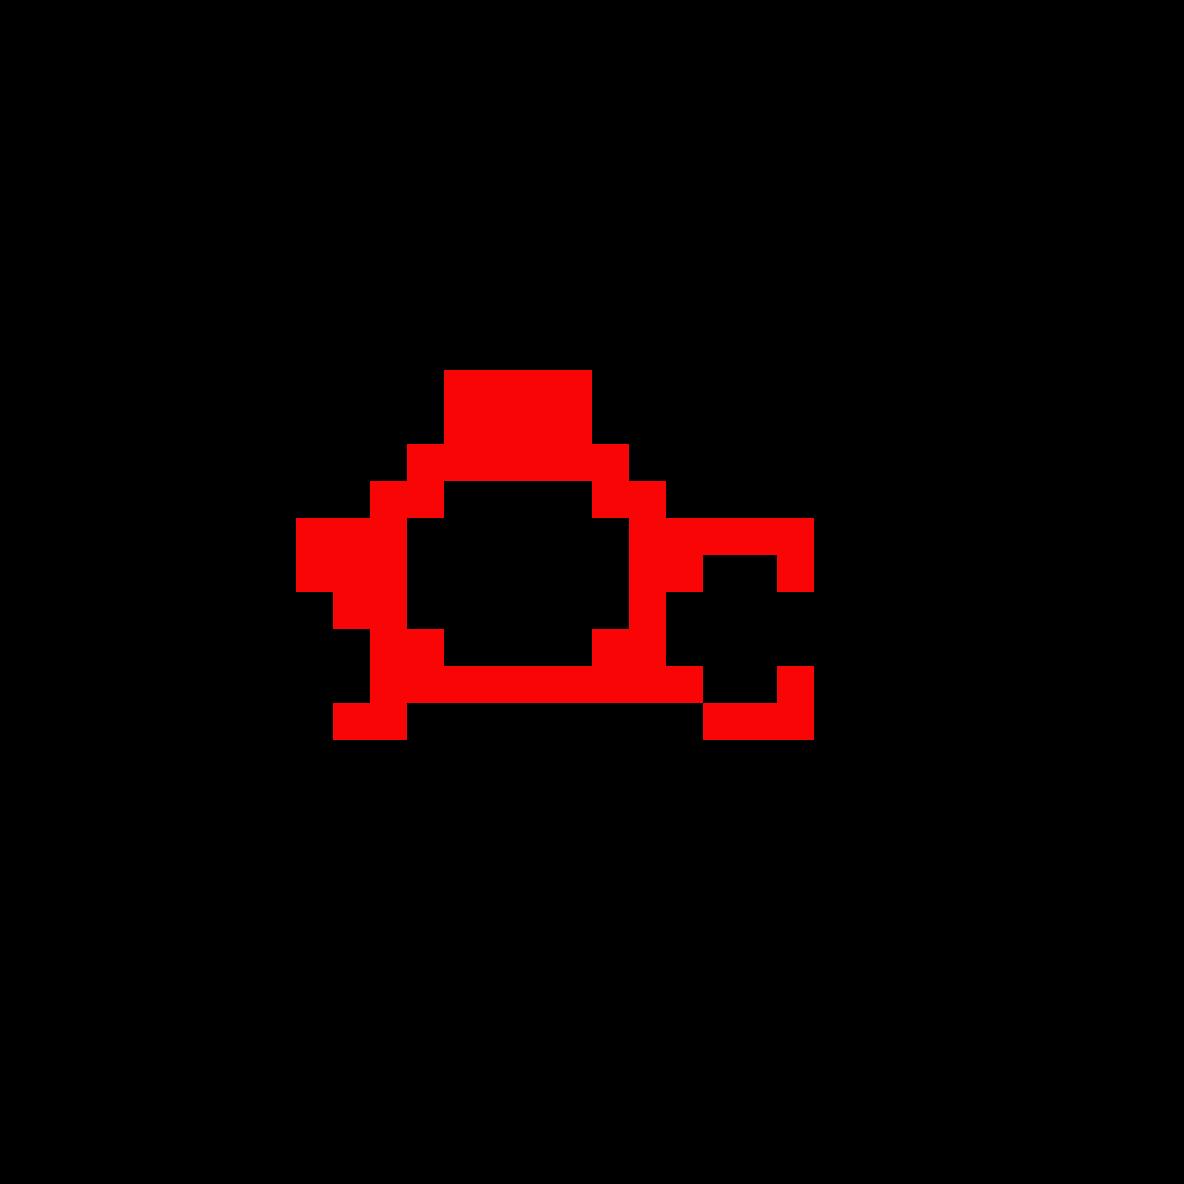 Pixilart - Mushroom (Super Mario Bros.) by NinjaNasir